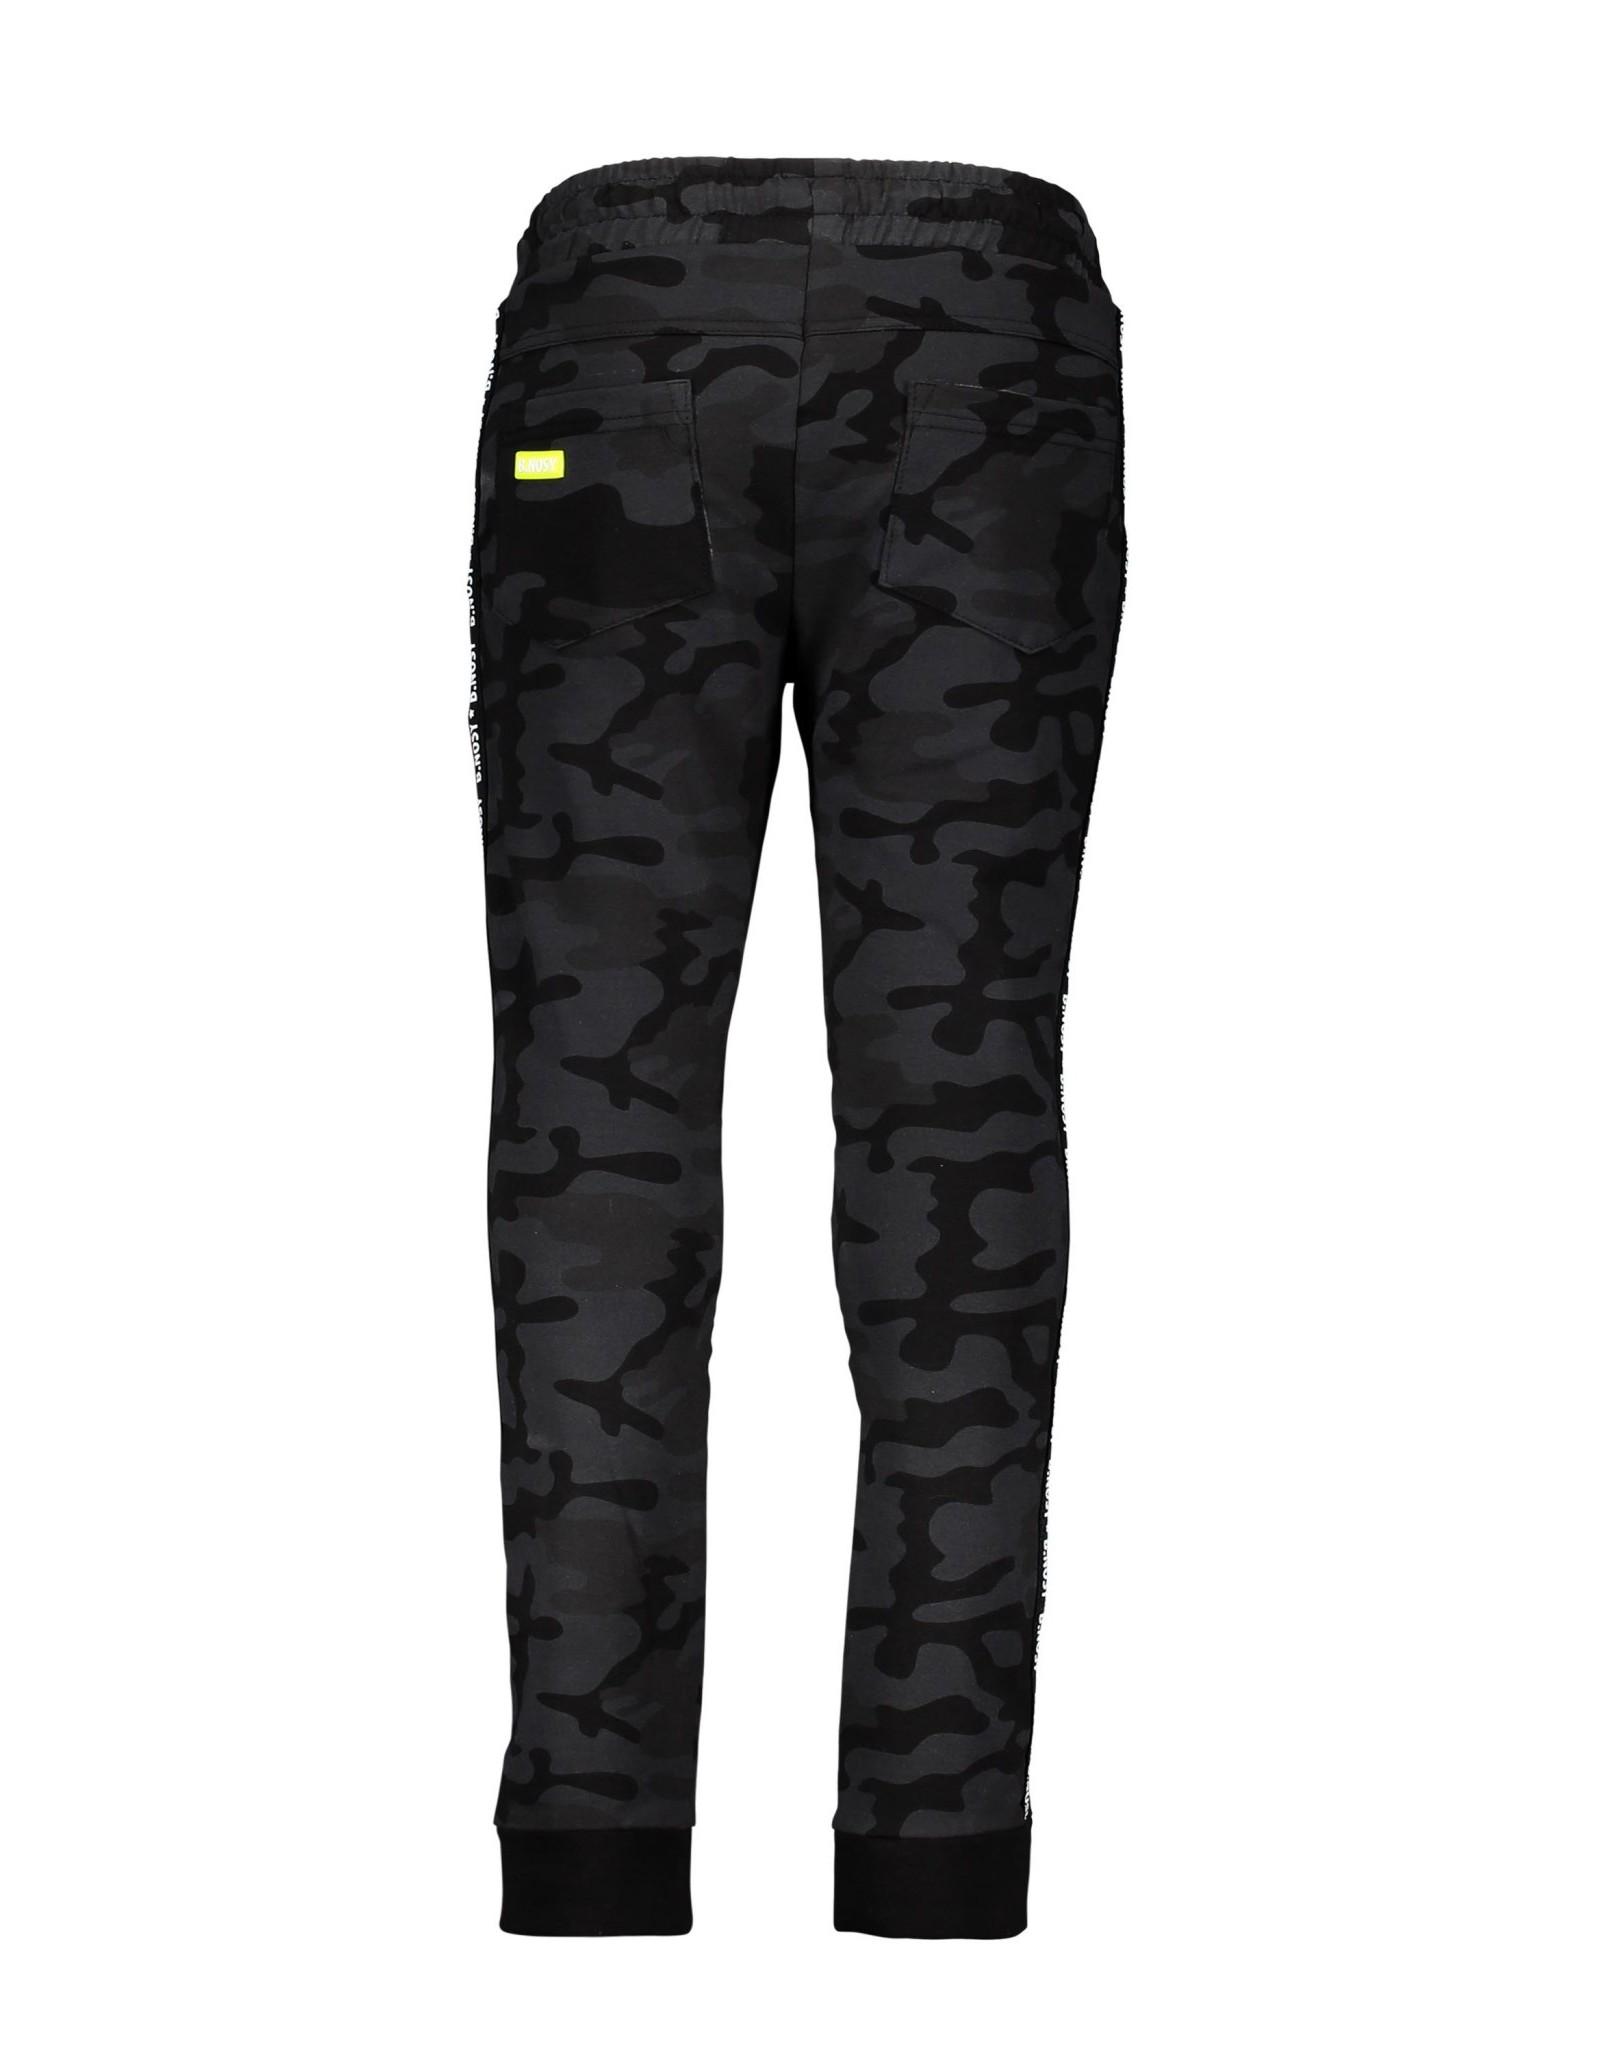 B.Nosy B.Nosy jongens joggingbroek Fast Camouflage Black